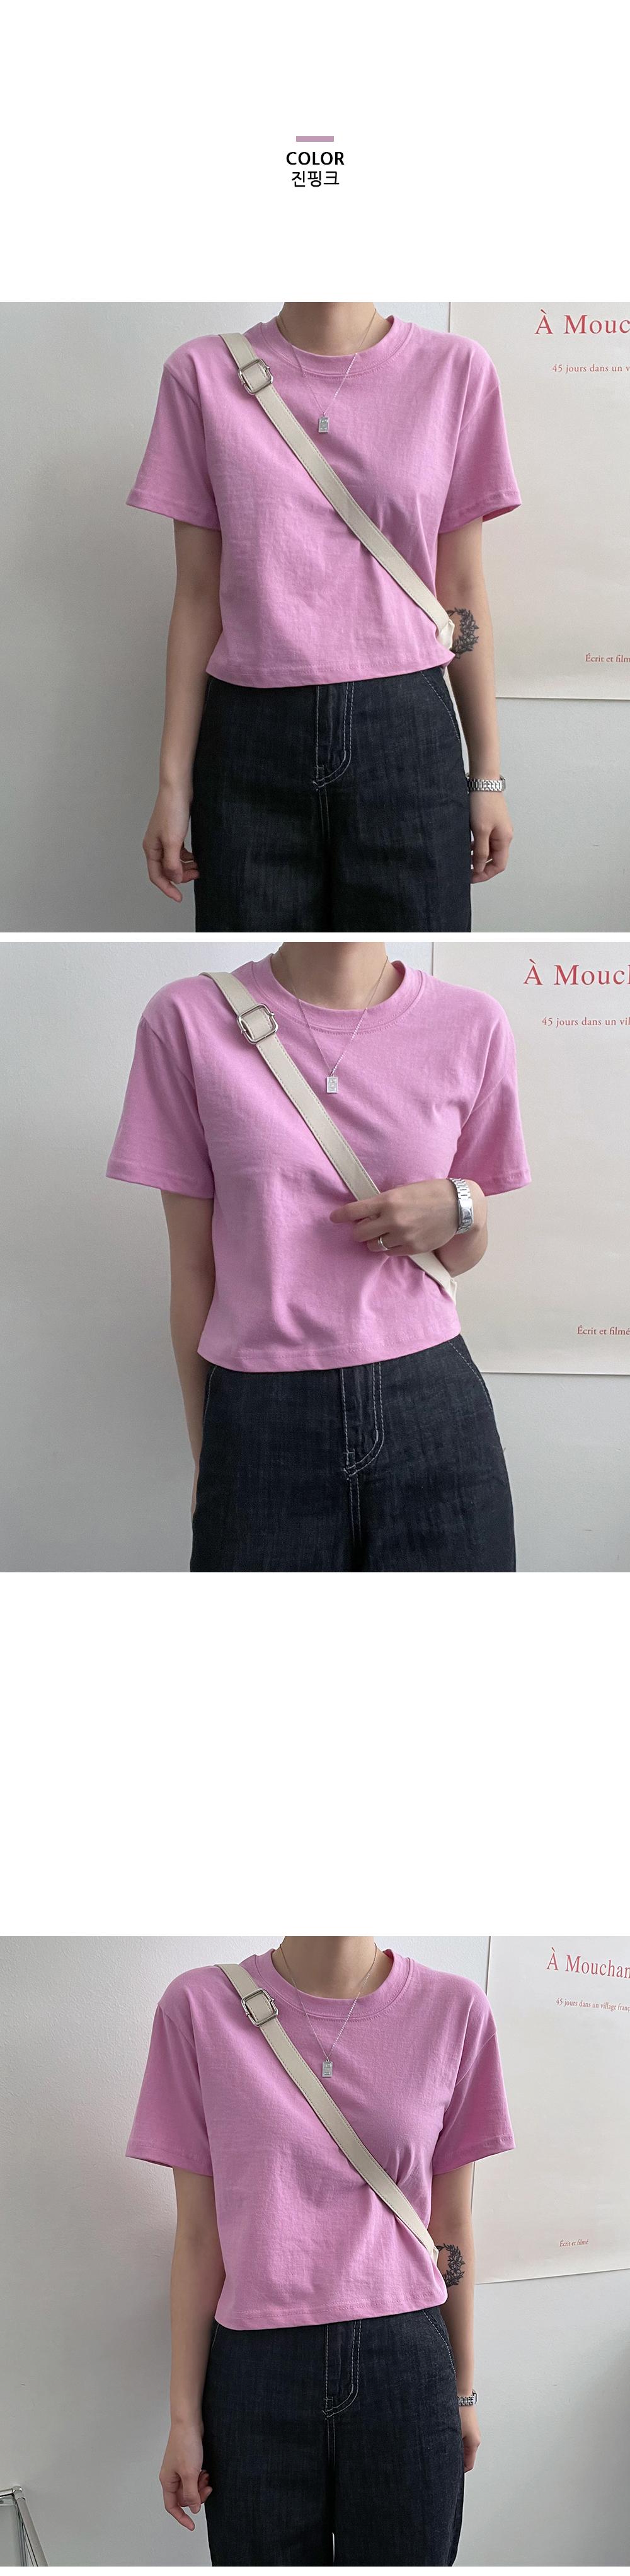 dress product image-S1L23